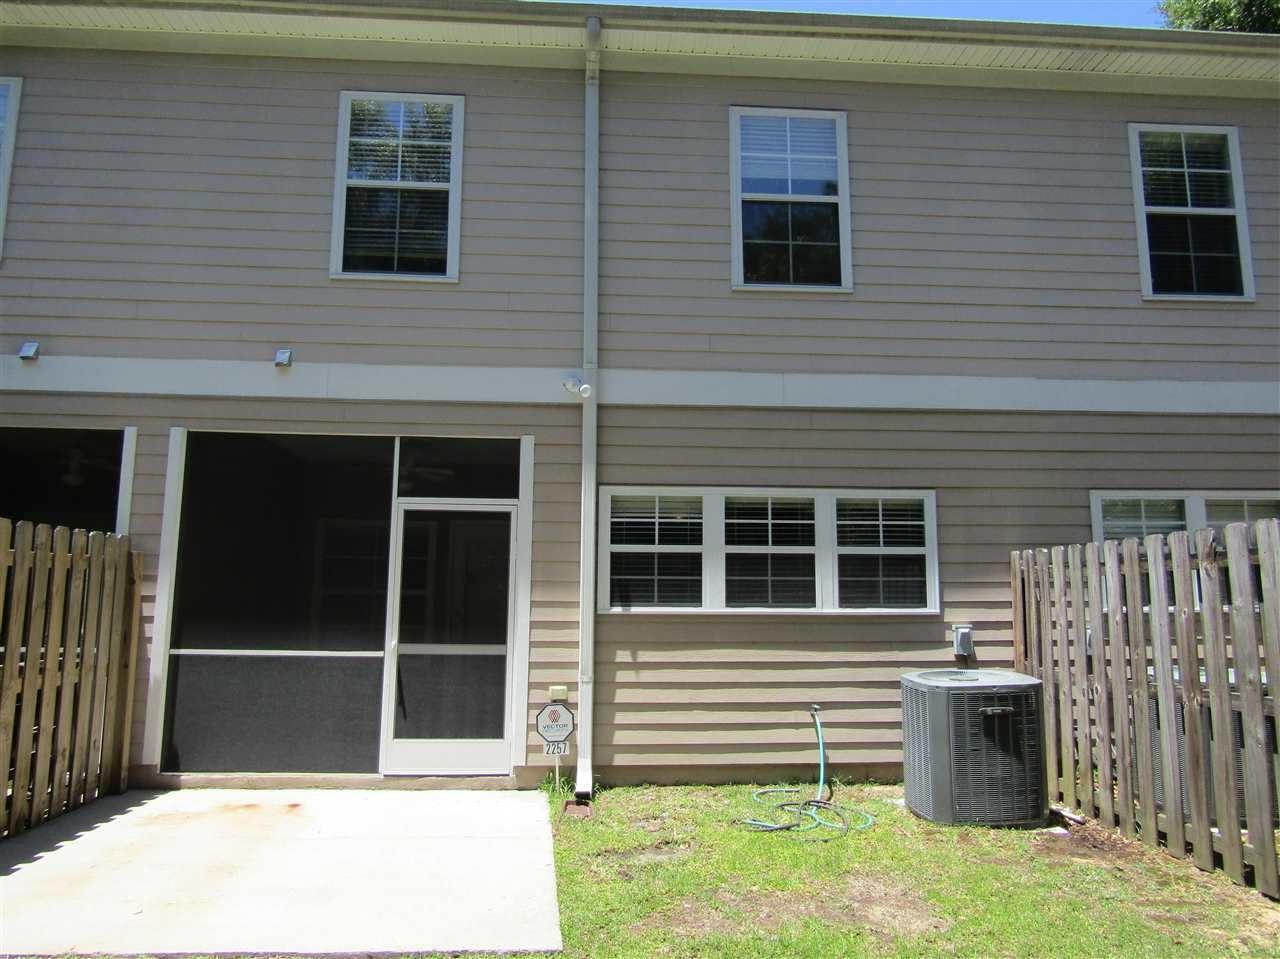 Photo of 2257 Graphene Lane, TALLAHASSEE, FL 32310 (MLS # 332287)